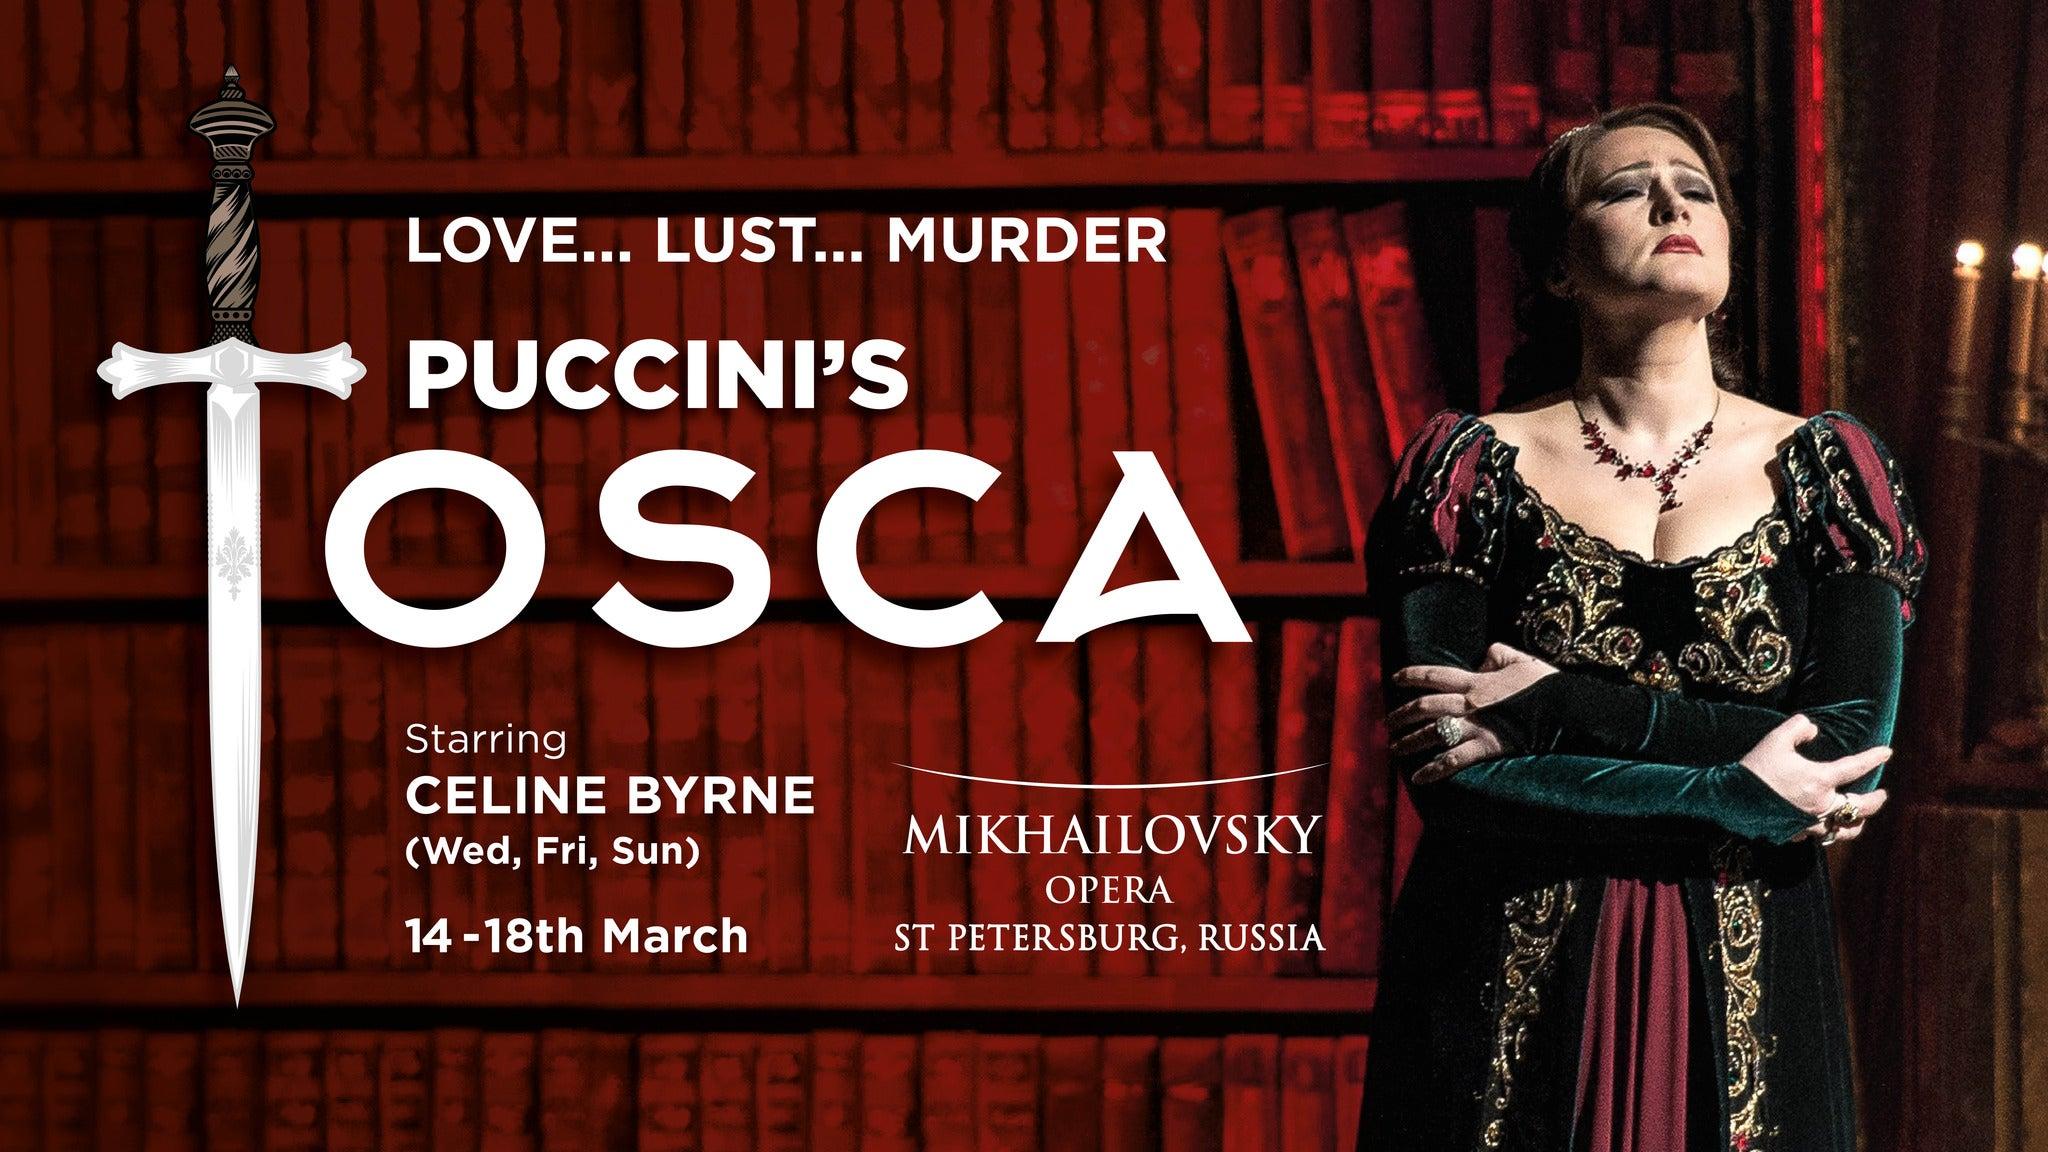 Tosca at Detroit Opera House at Detroit Opera House - Detroit, MI 48226